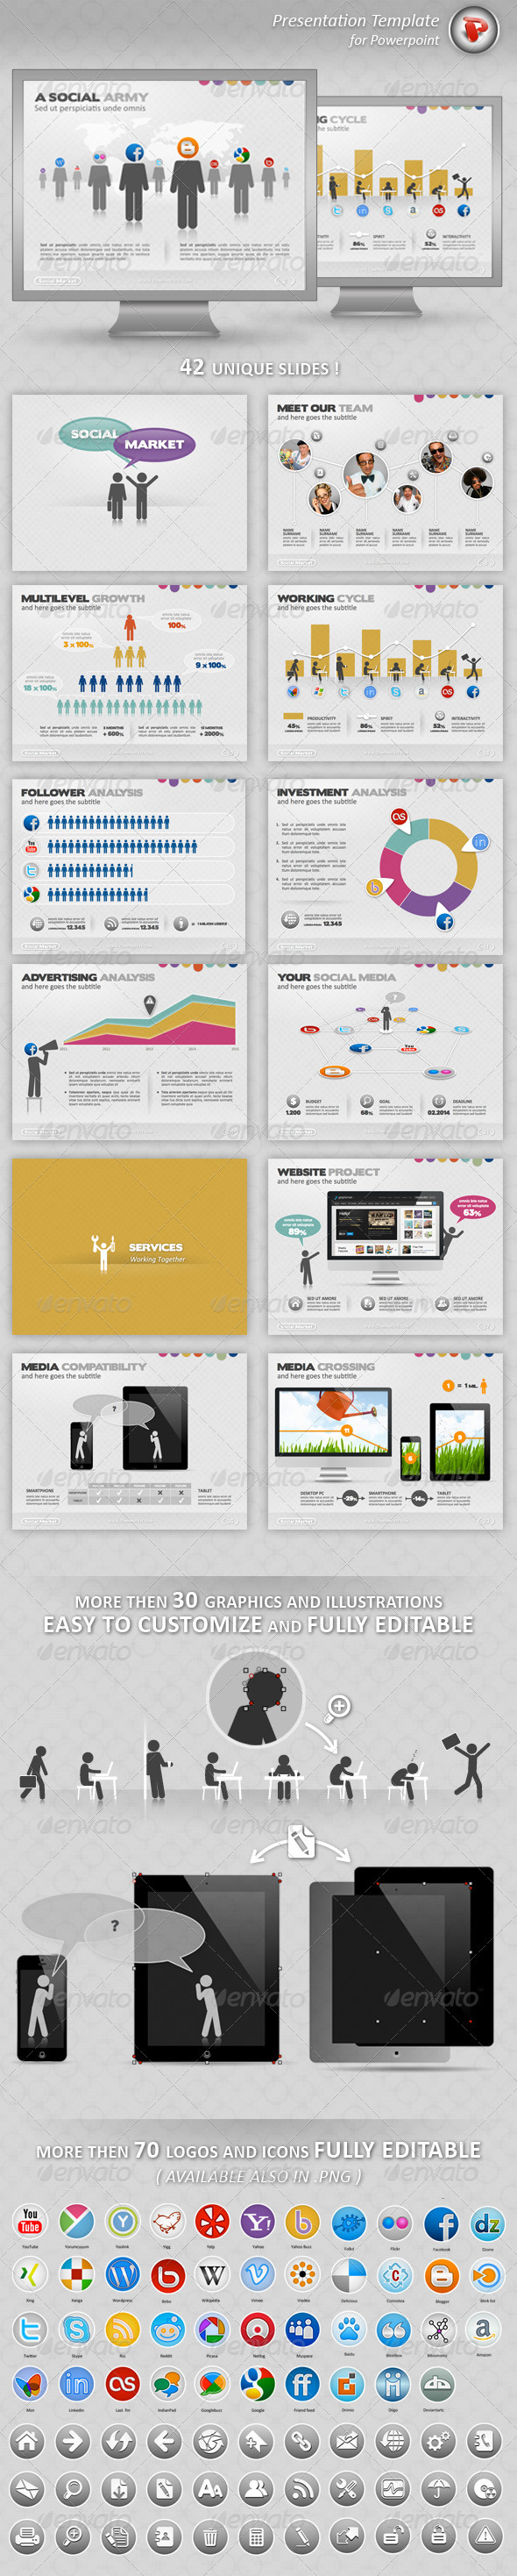 GraphicRiver Social Market Powerpoint Presentation 3630738